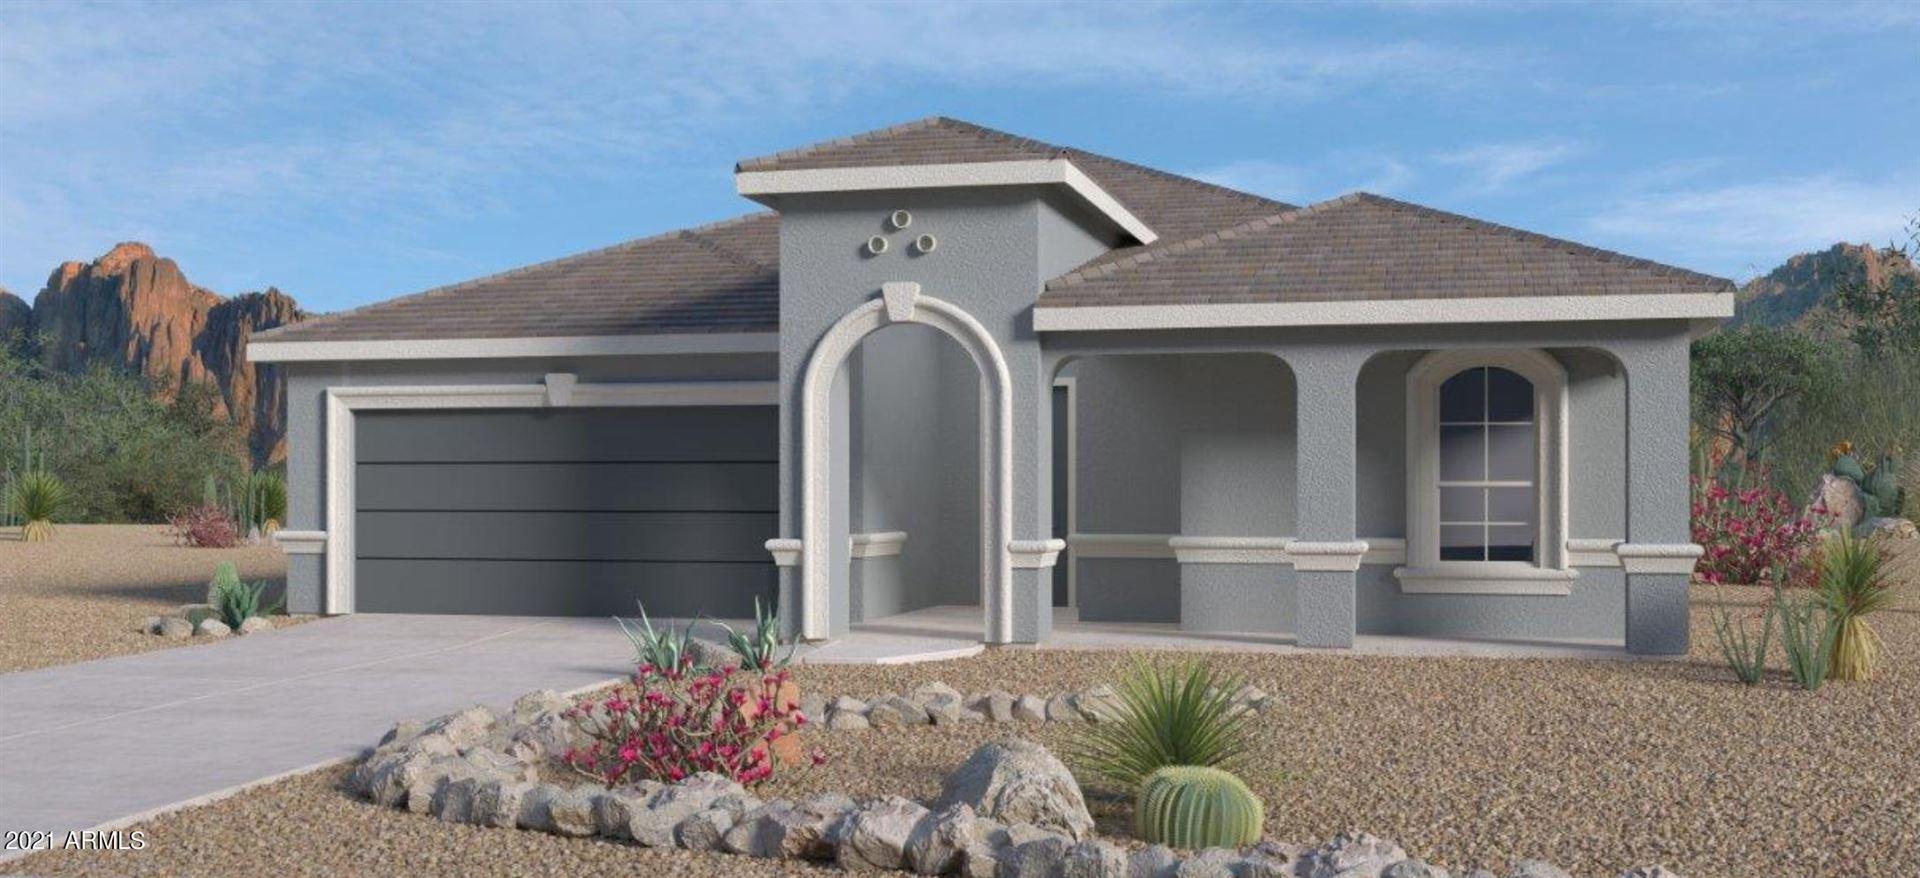 Photo for 16943 N PALO AZUL Road, Maricopa, AZ 85138 (MLS # 6228641)